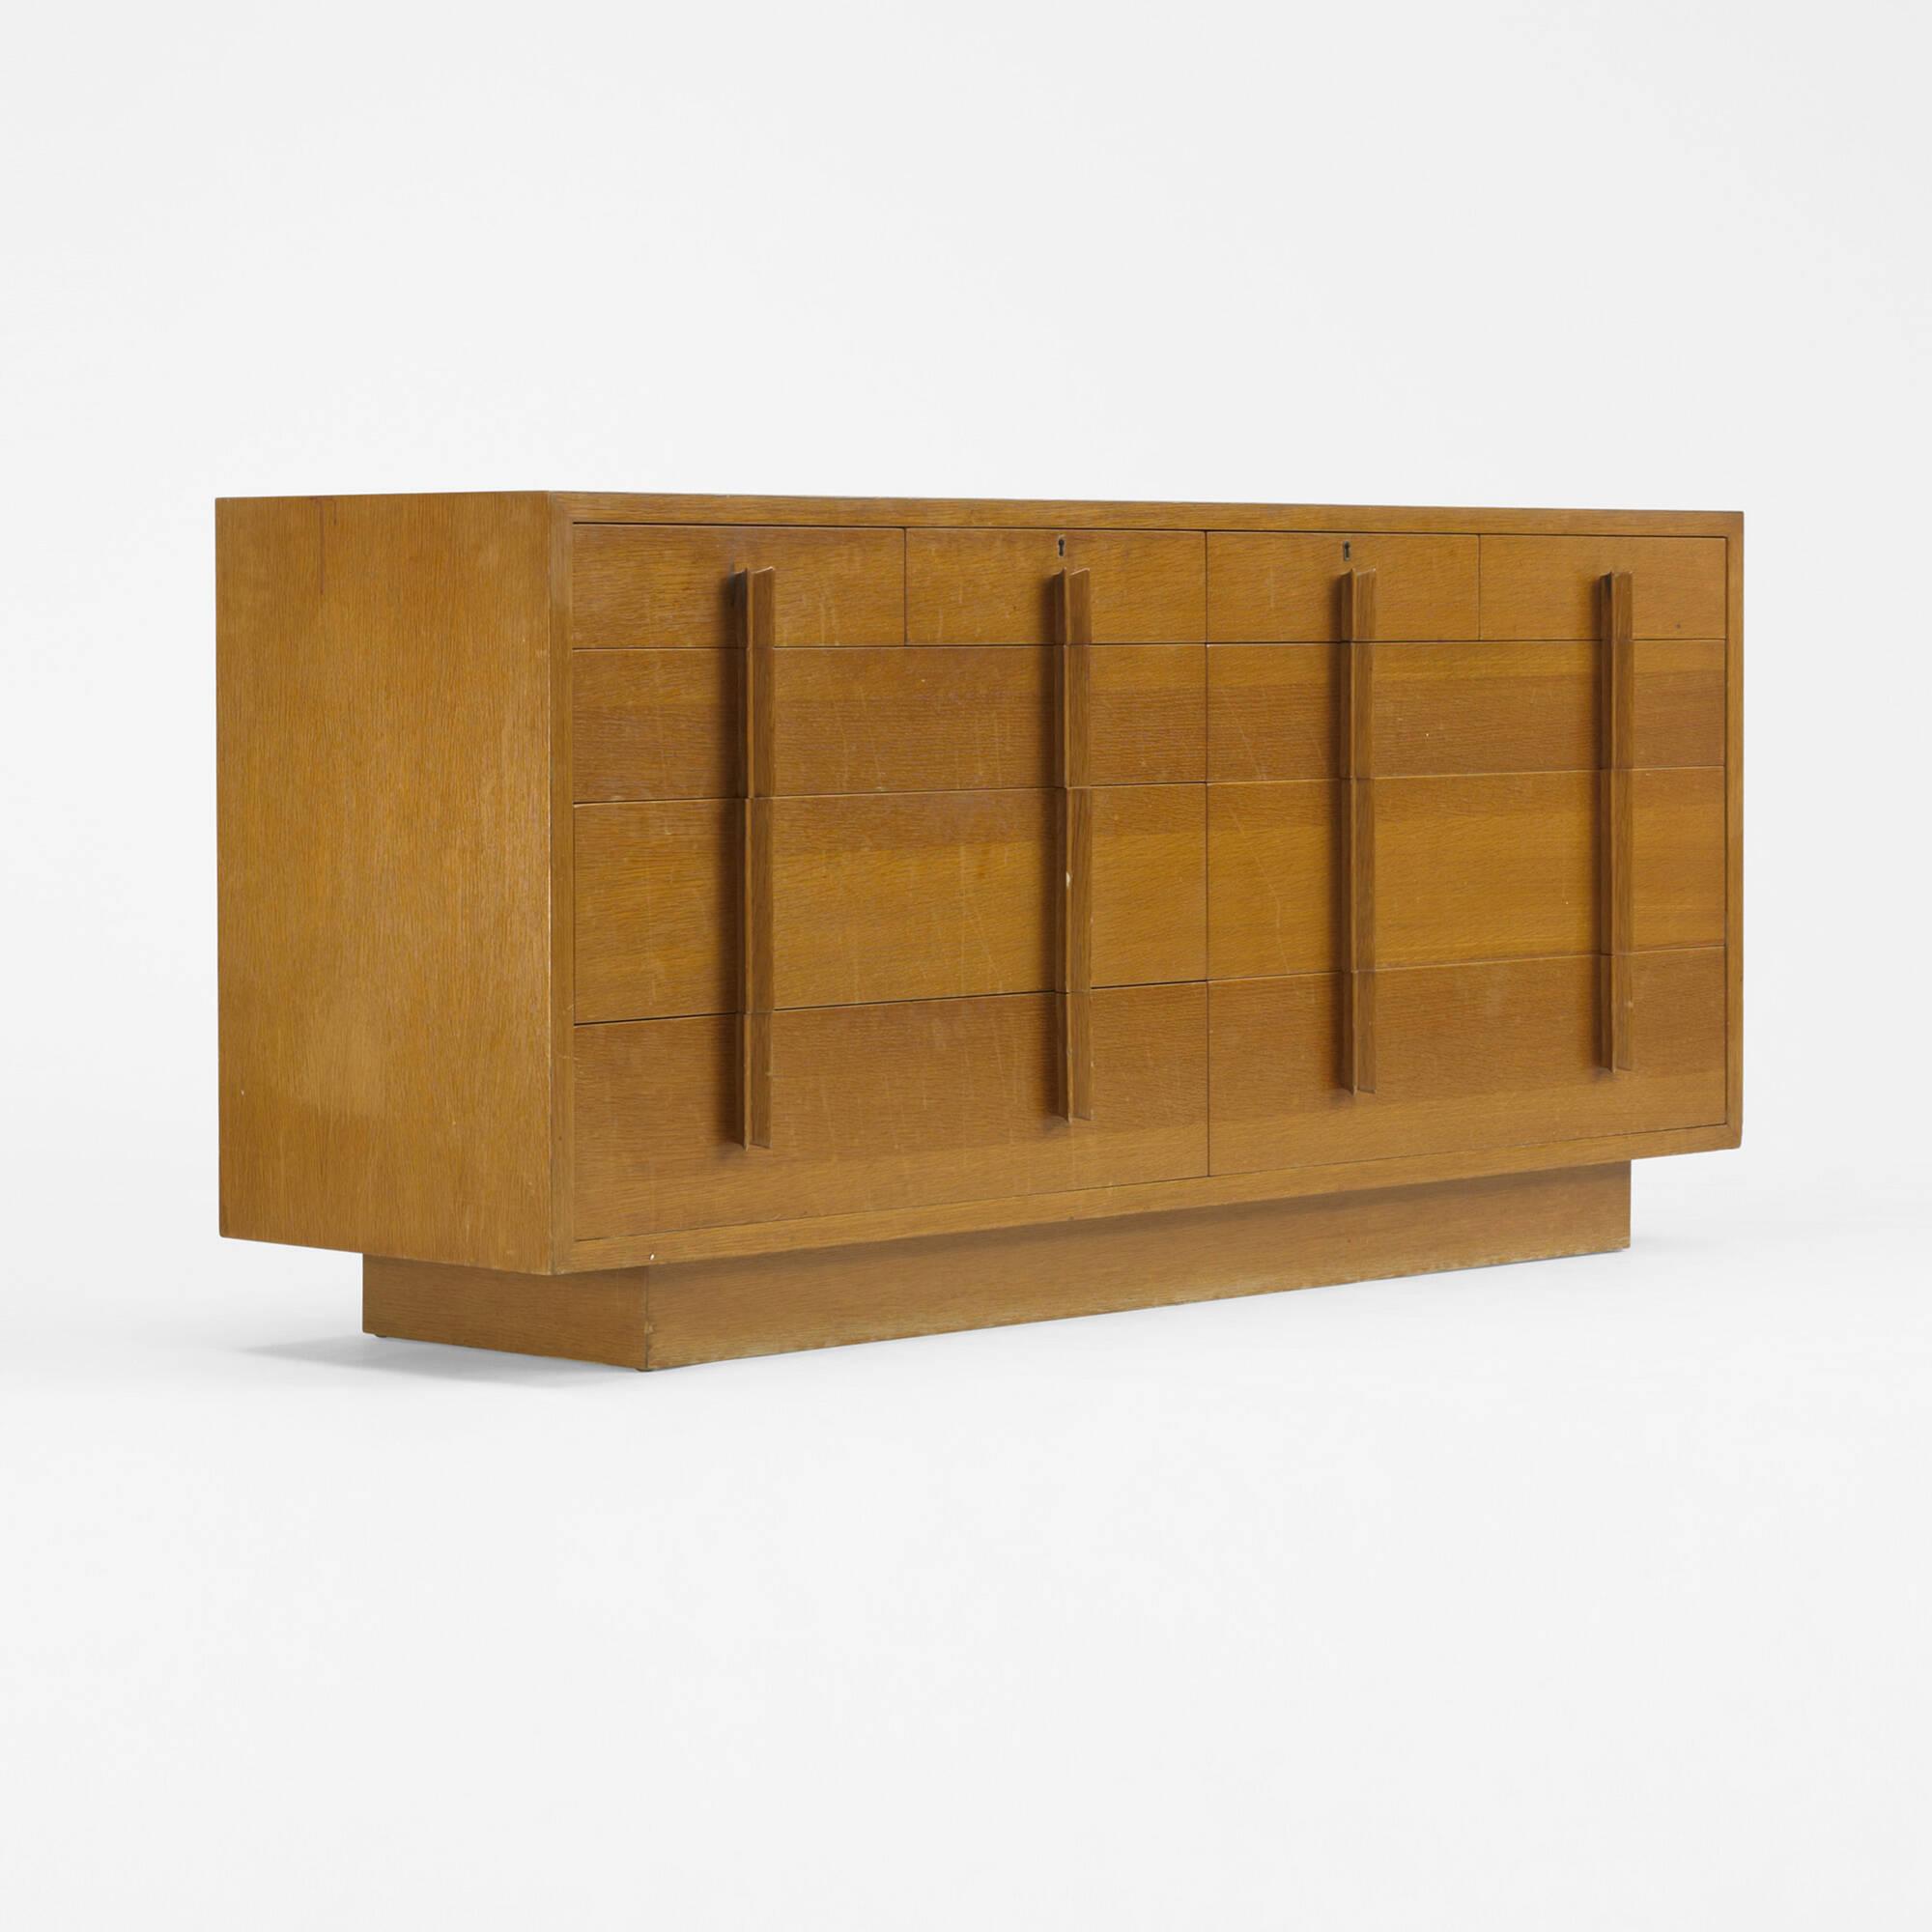 Modern Home Design October 2012: 223: VLADIMIR KAGAN, Cabinet From A Manhattan Interior